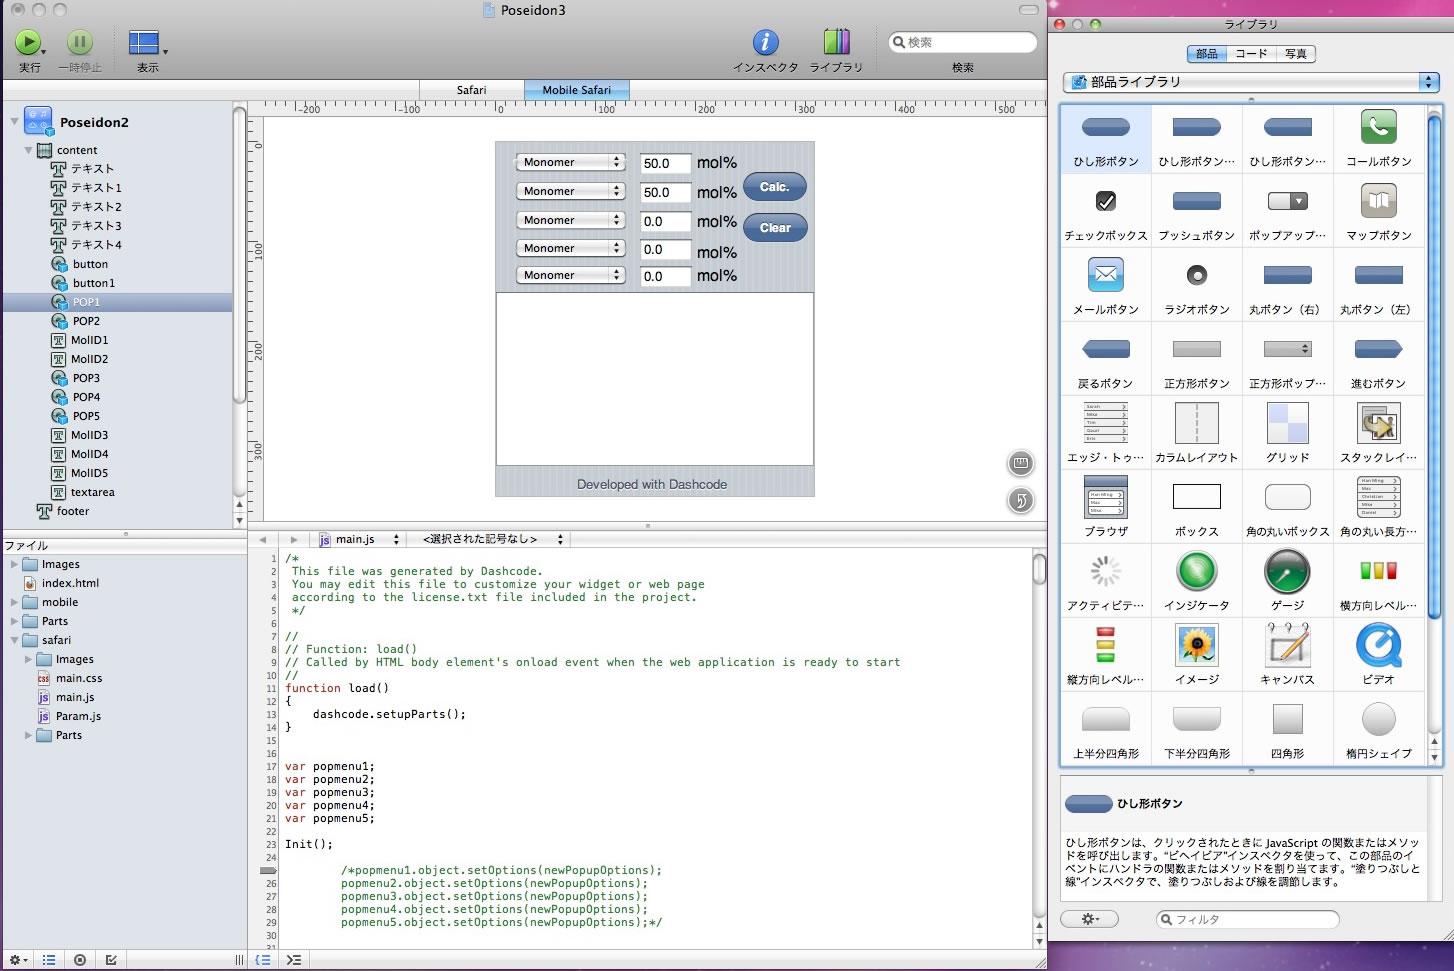 javascript how to write a carraige return into a file